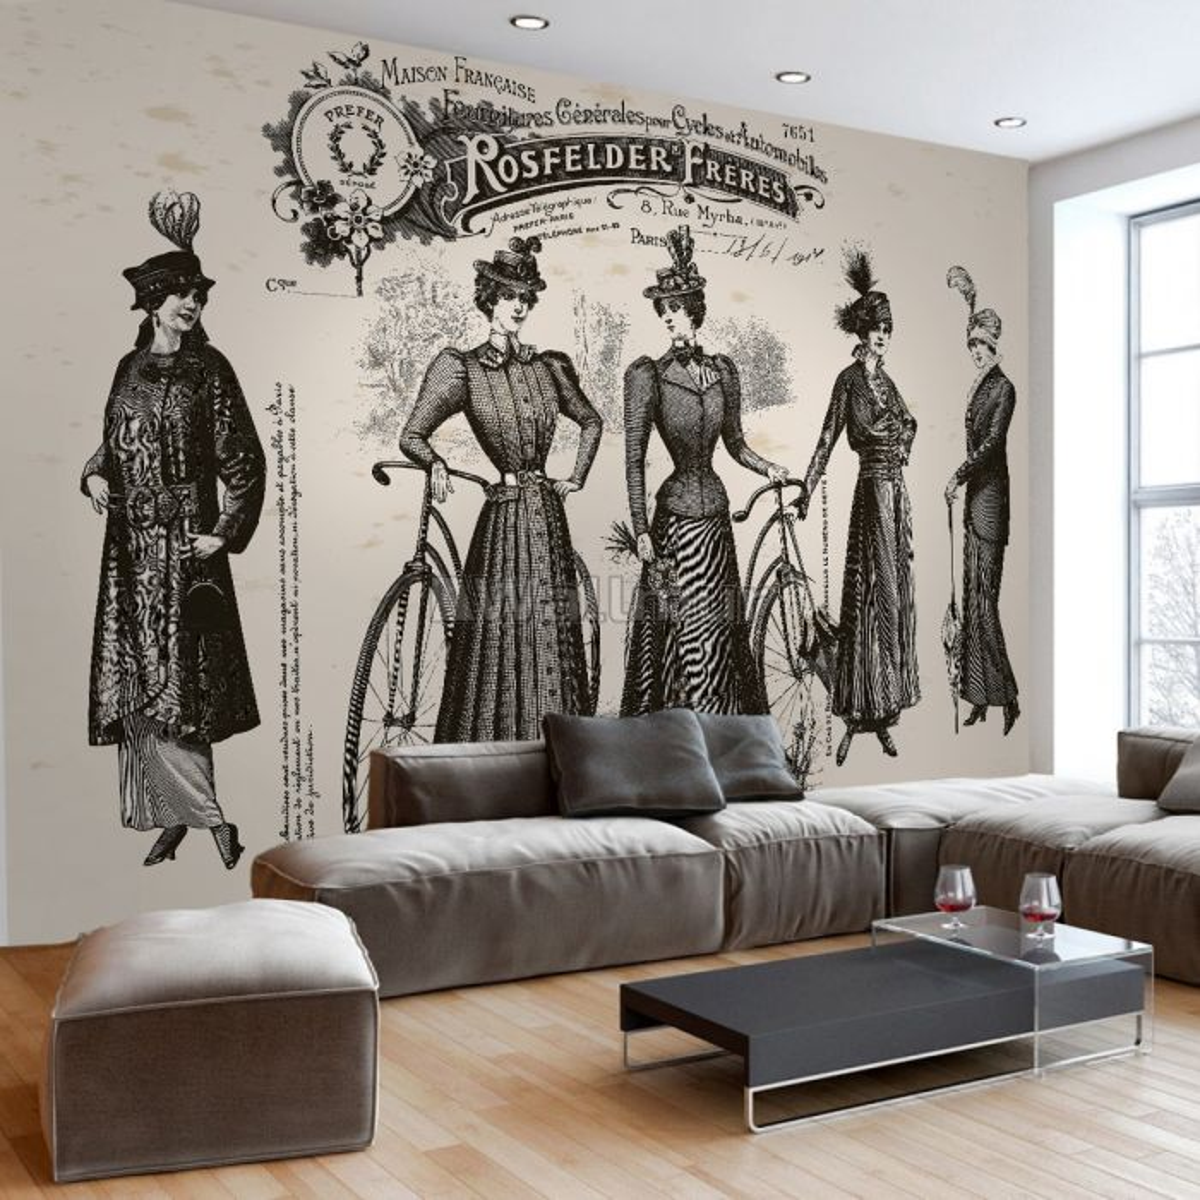 Retro French Clothing Art Wallpaper Mural